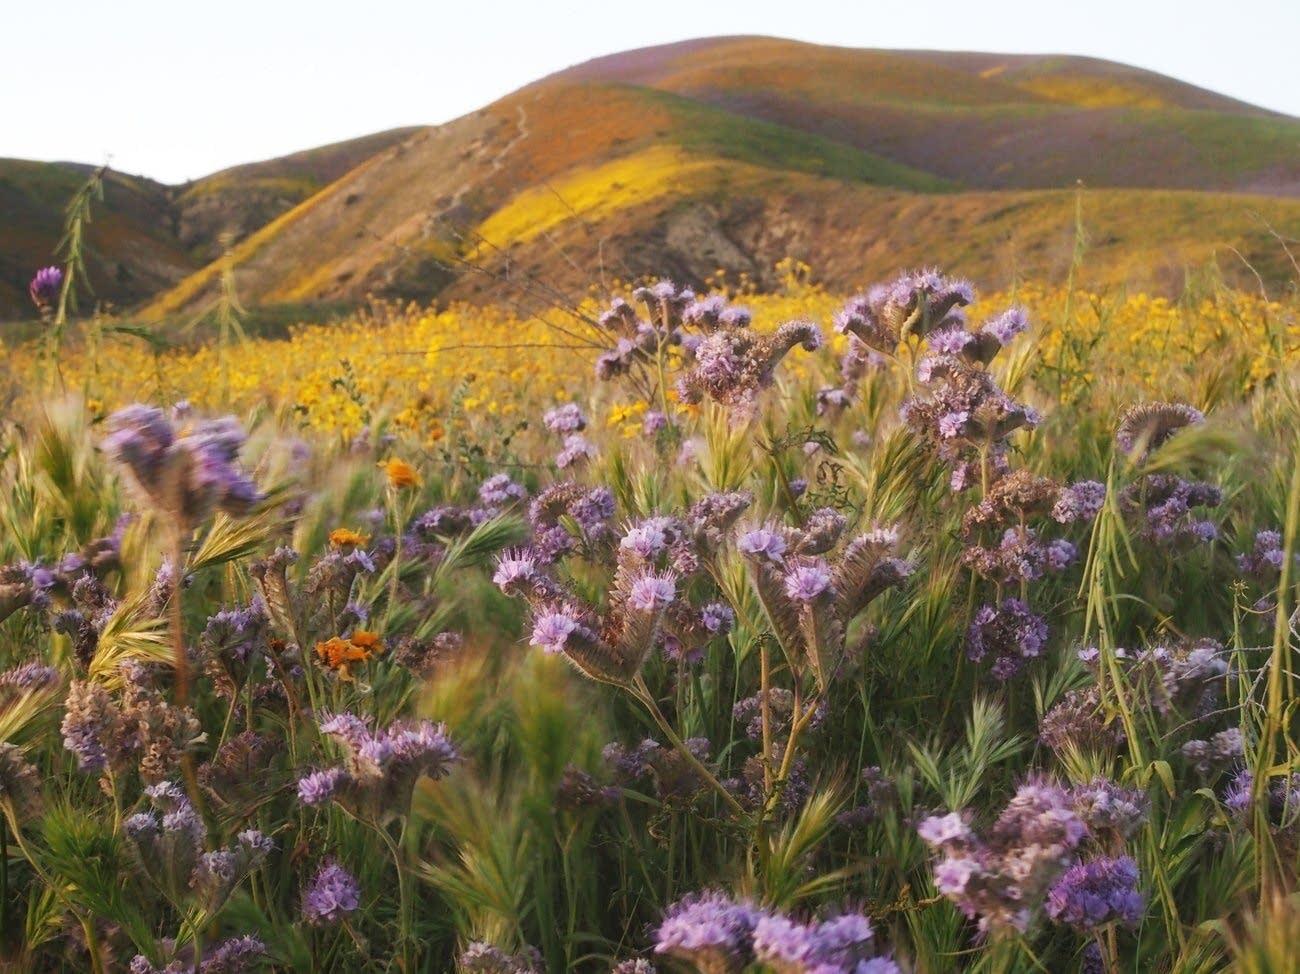 Tremblor Range in Carrizo Plain National Monument